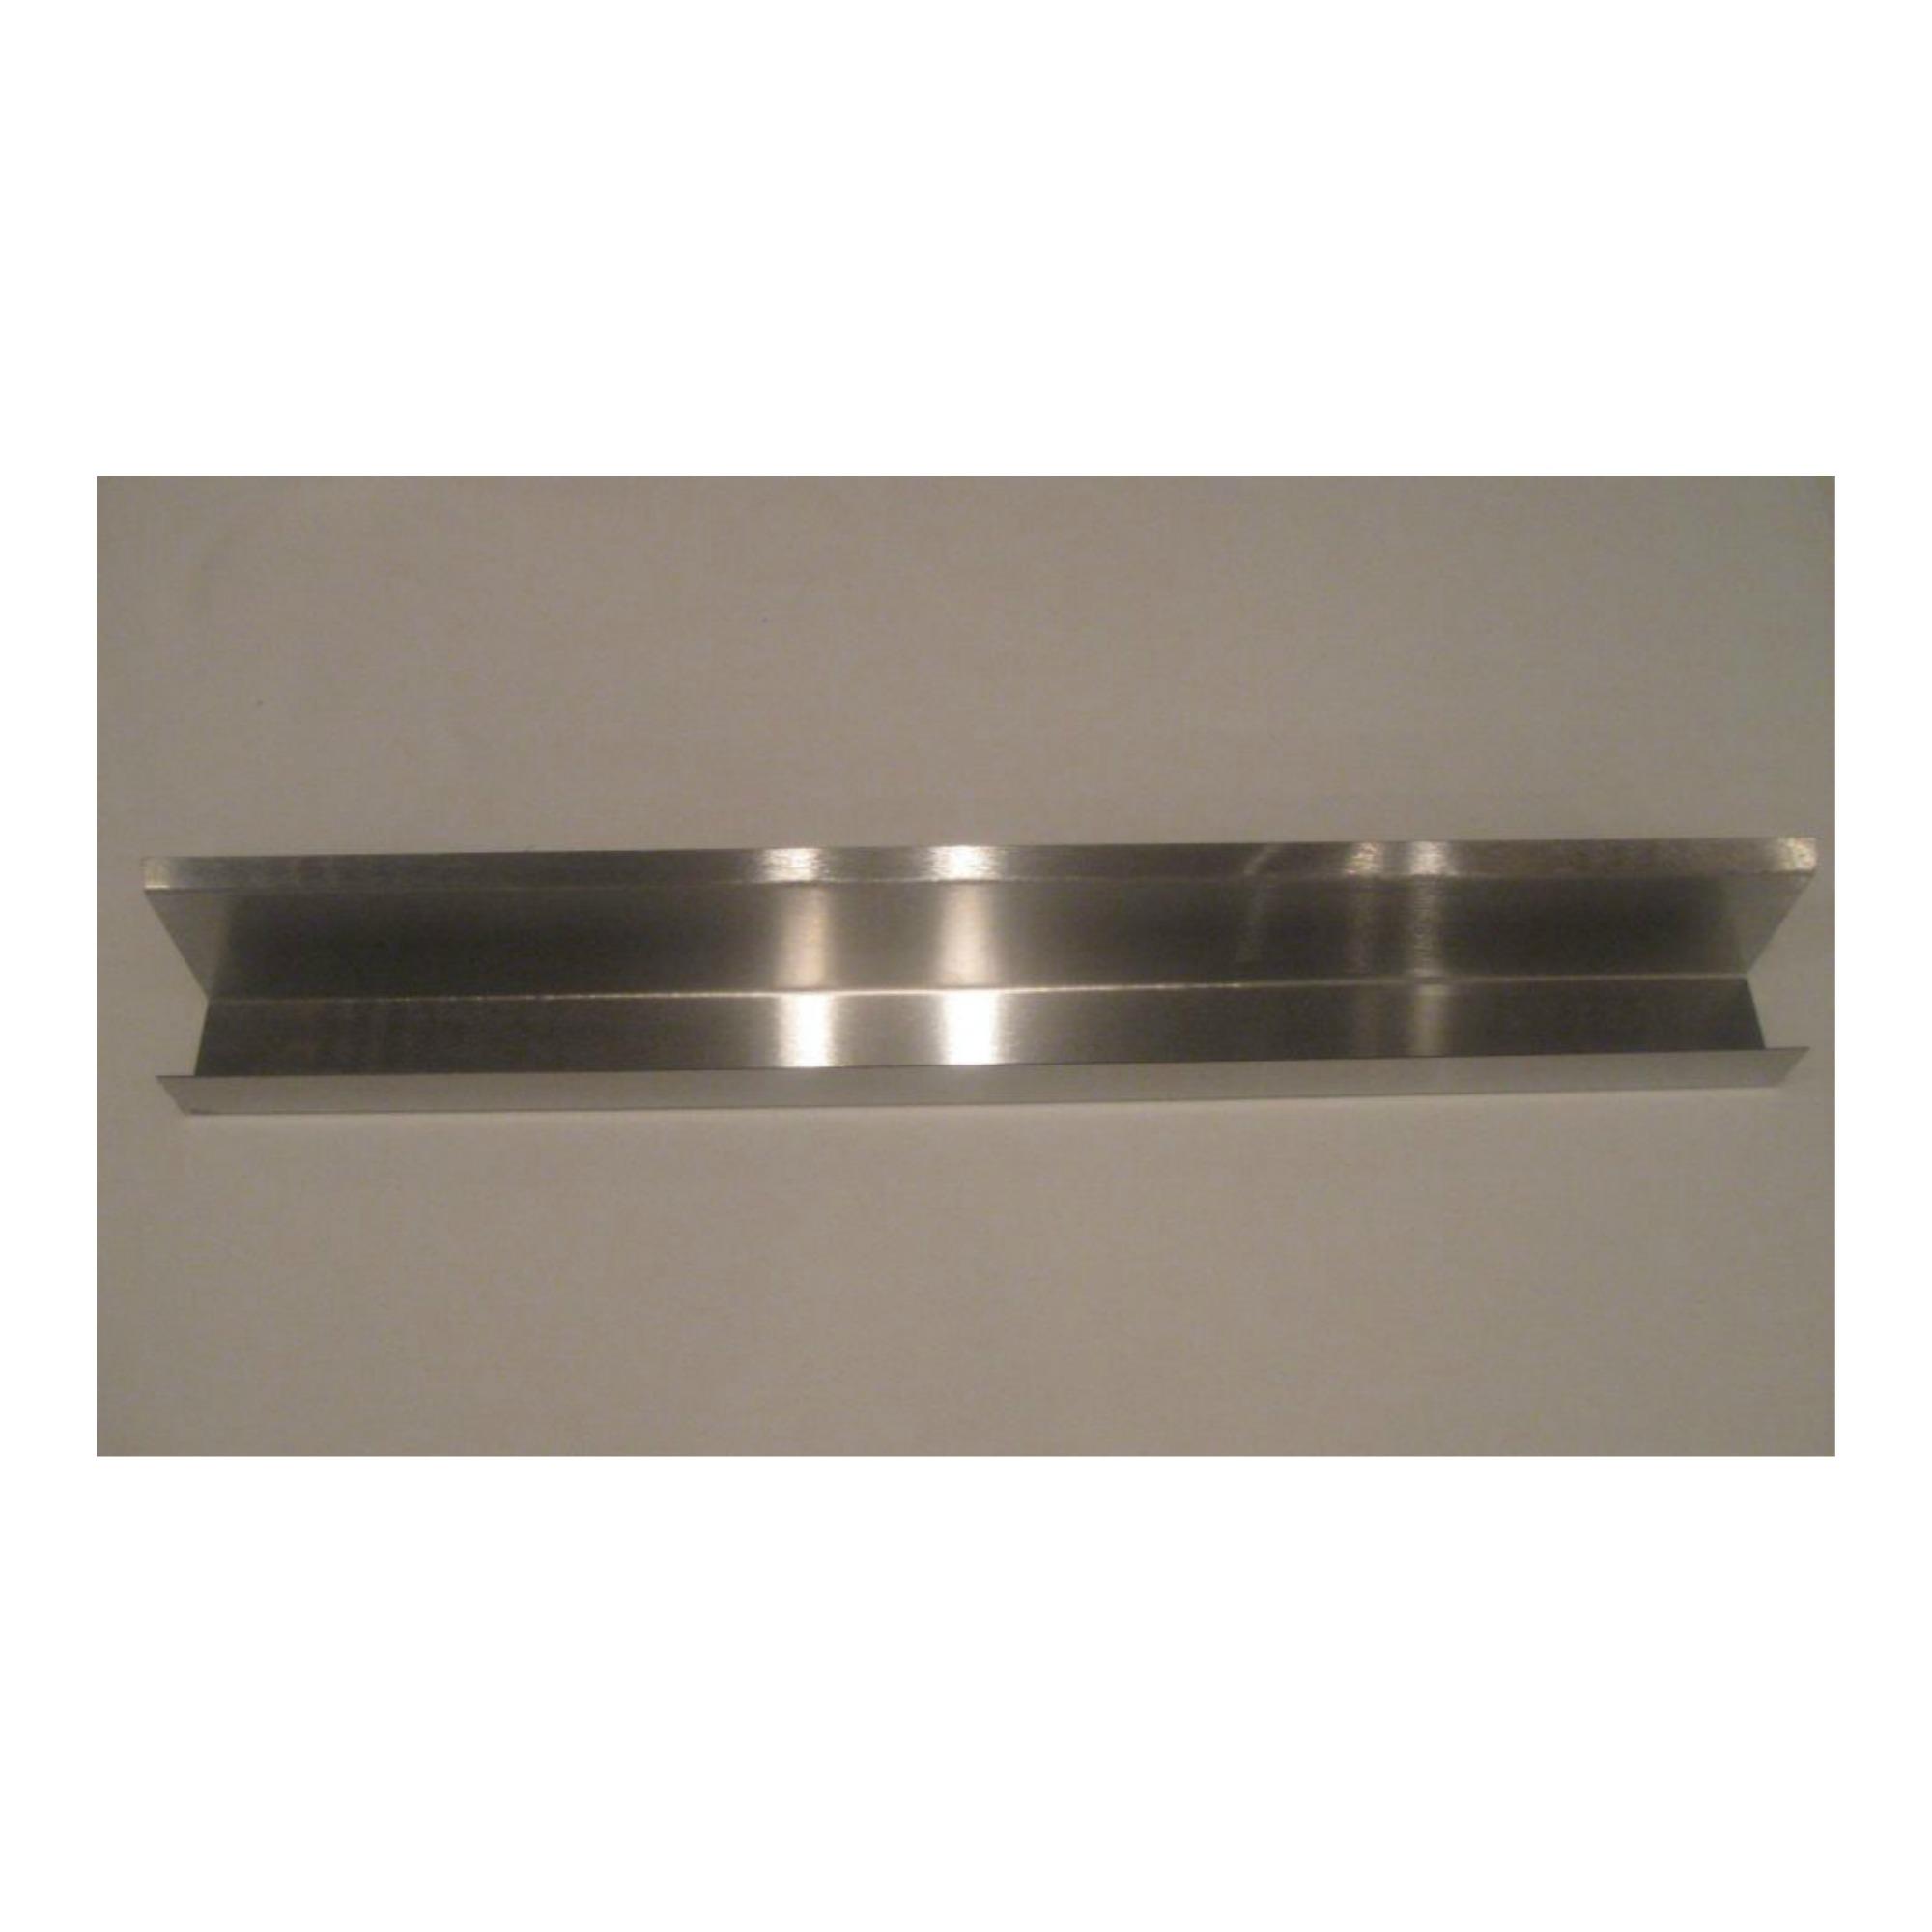 111-121 Kozy Heat Stainless Steel Firebrick Retainer